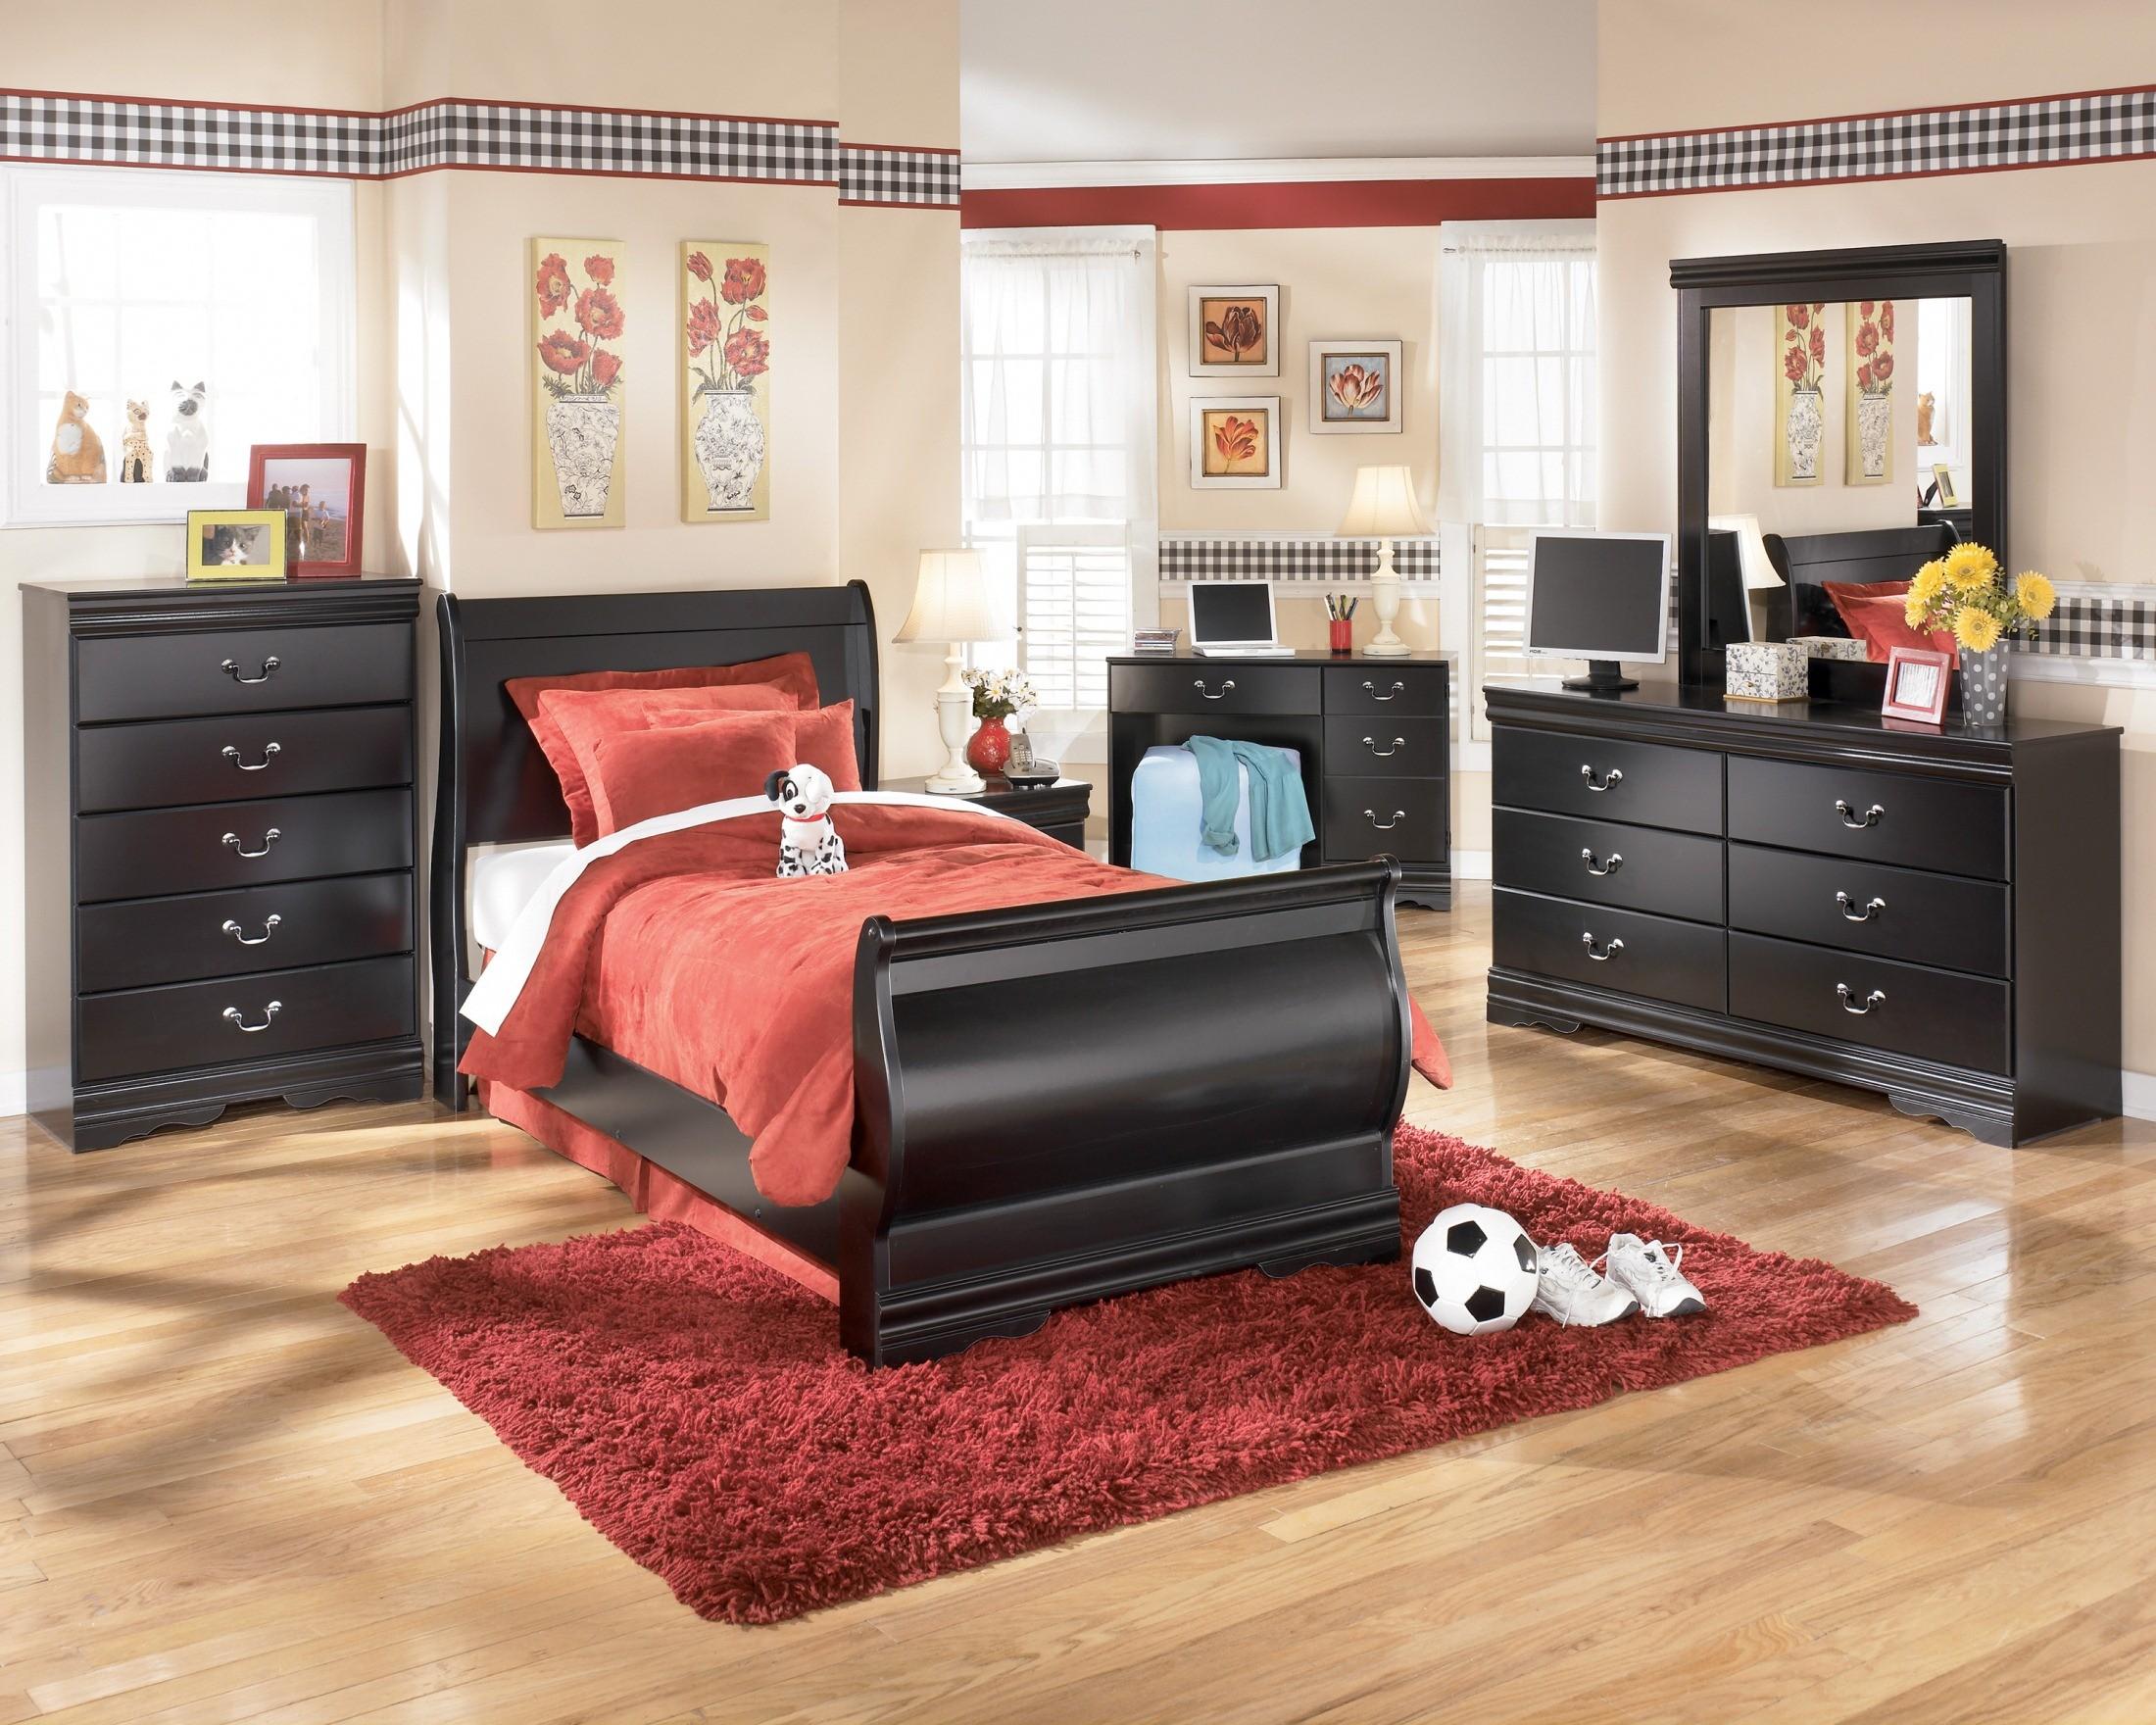 Ashley Furniture Huey Vineyard Youth Bedroom Set B128 63